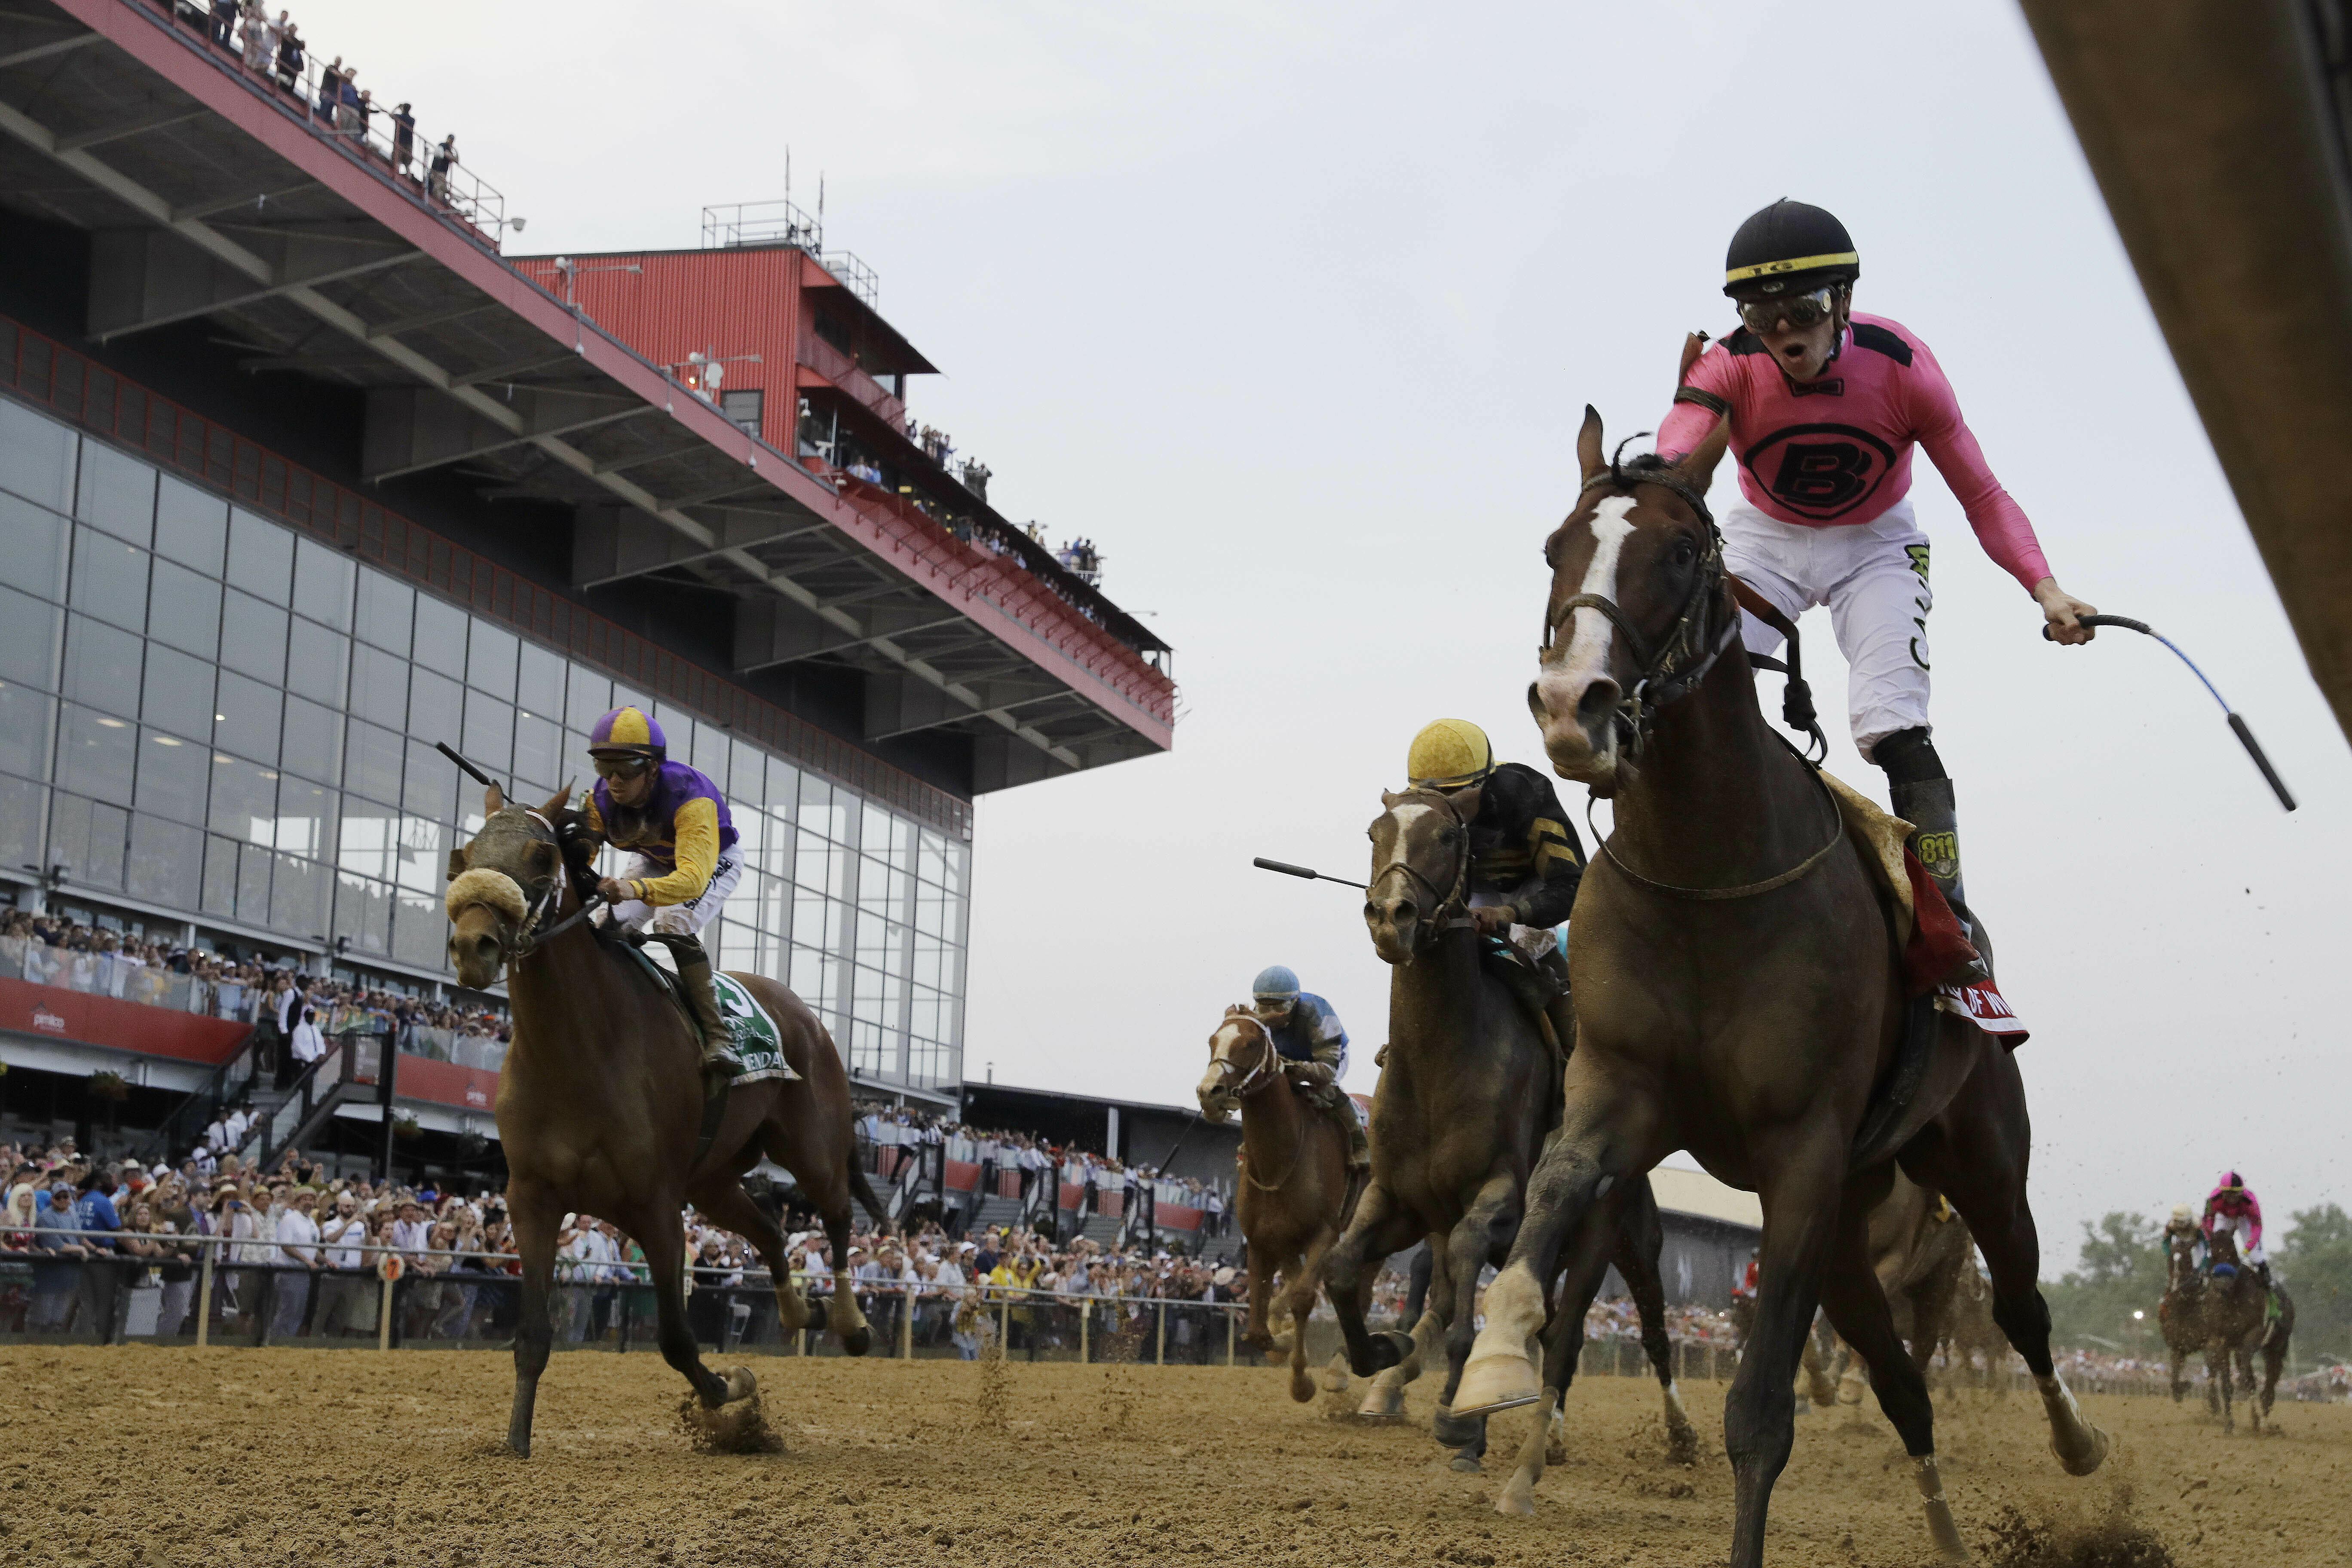 War of Will wins Preakness, also featuring a riderless running horse